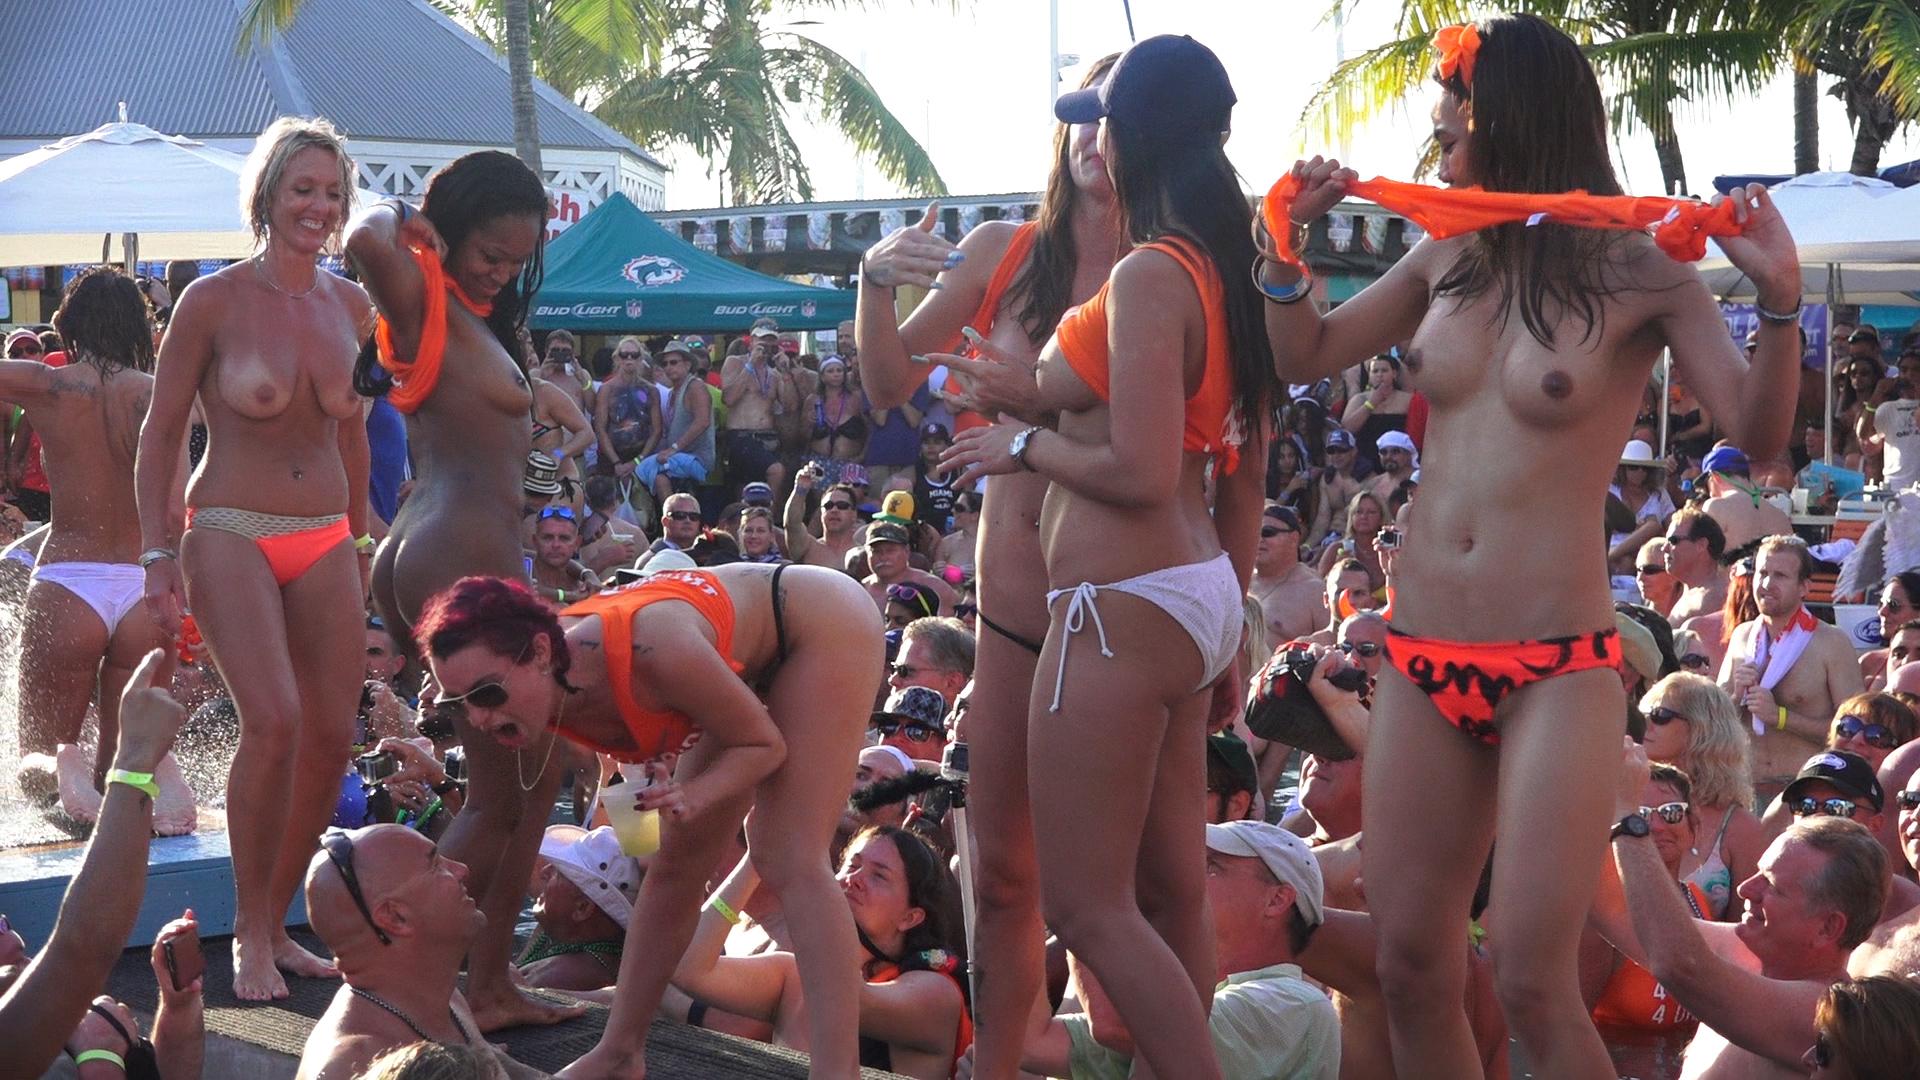 ... /010116_dantes_pool_party_at_fantasy_fest_2015_key_west_florida/4.jpg: tour.nebraskacoeds.com/index.php?page=2